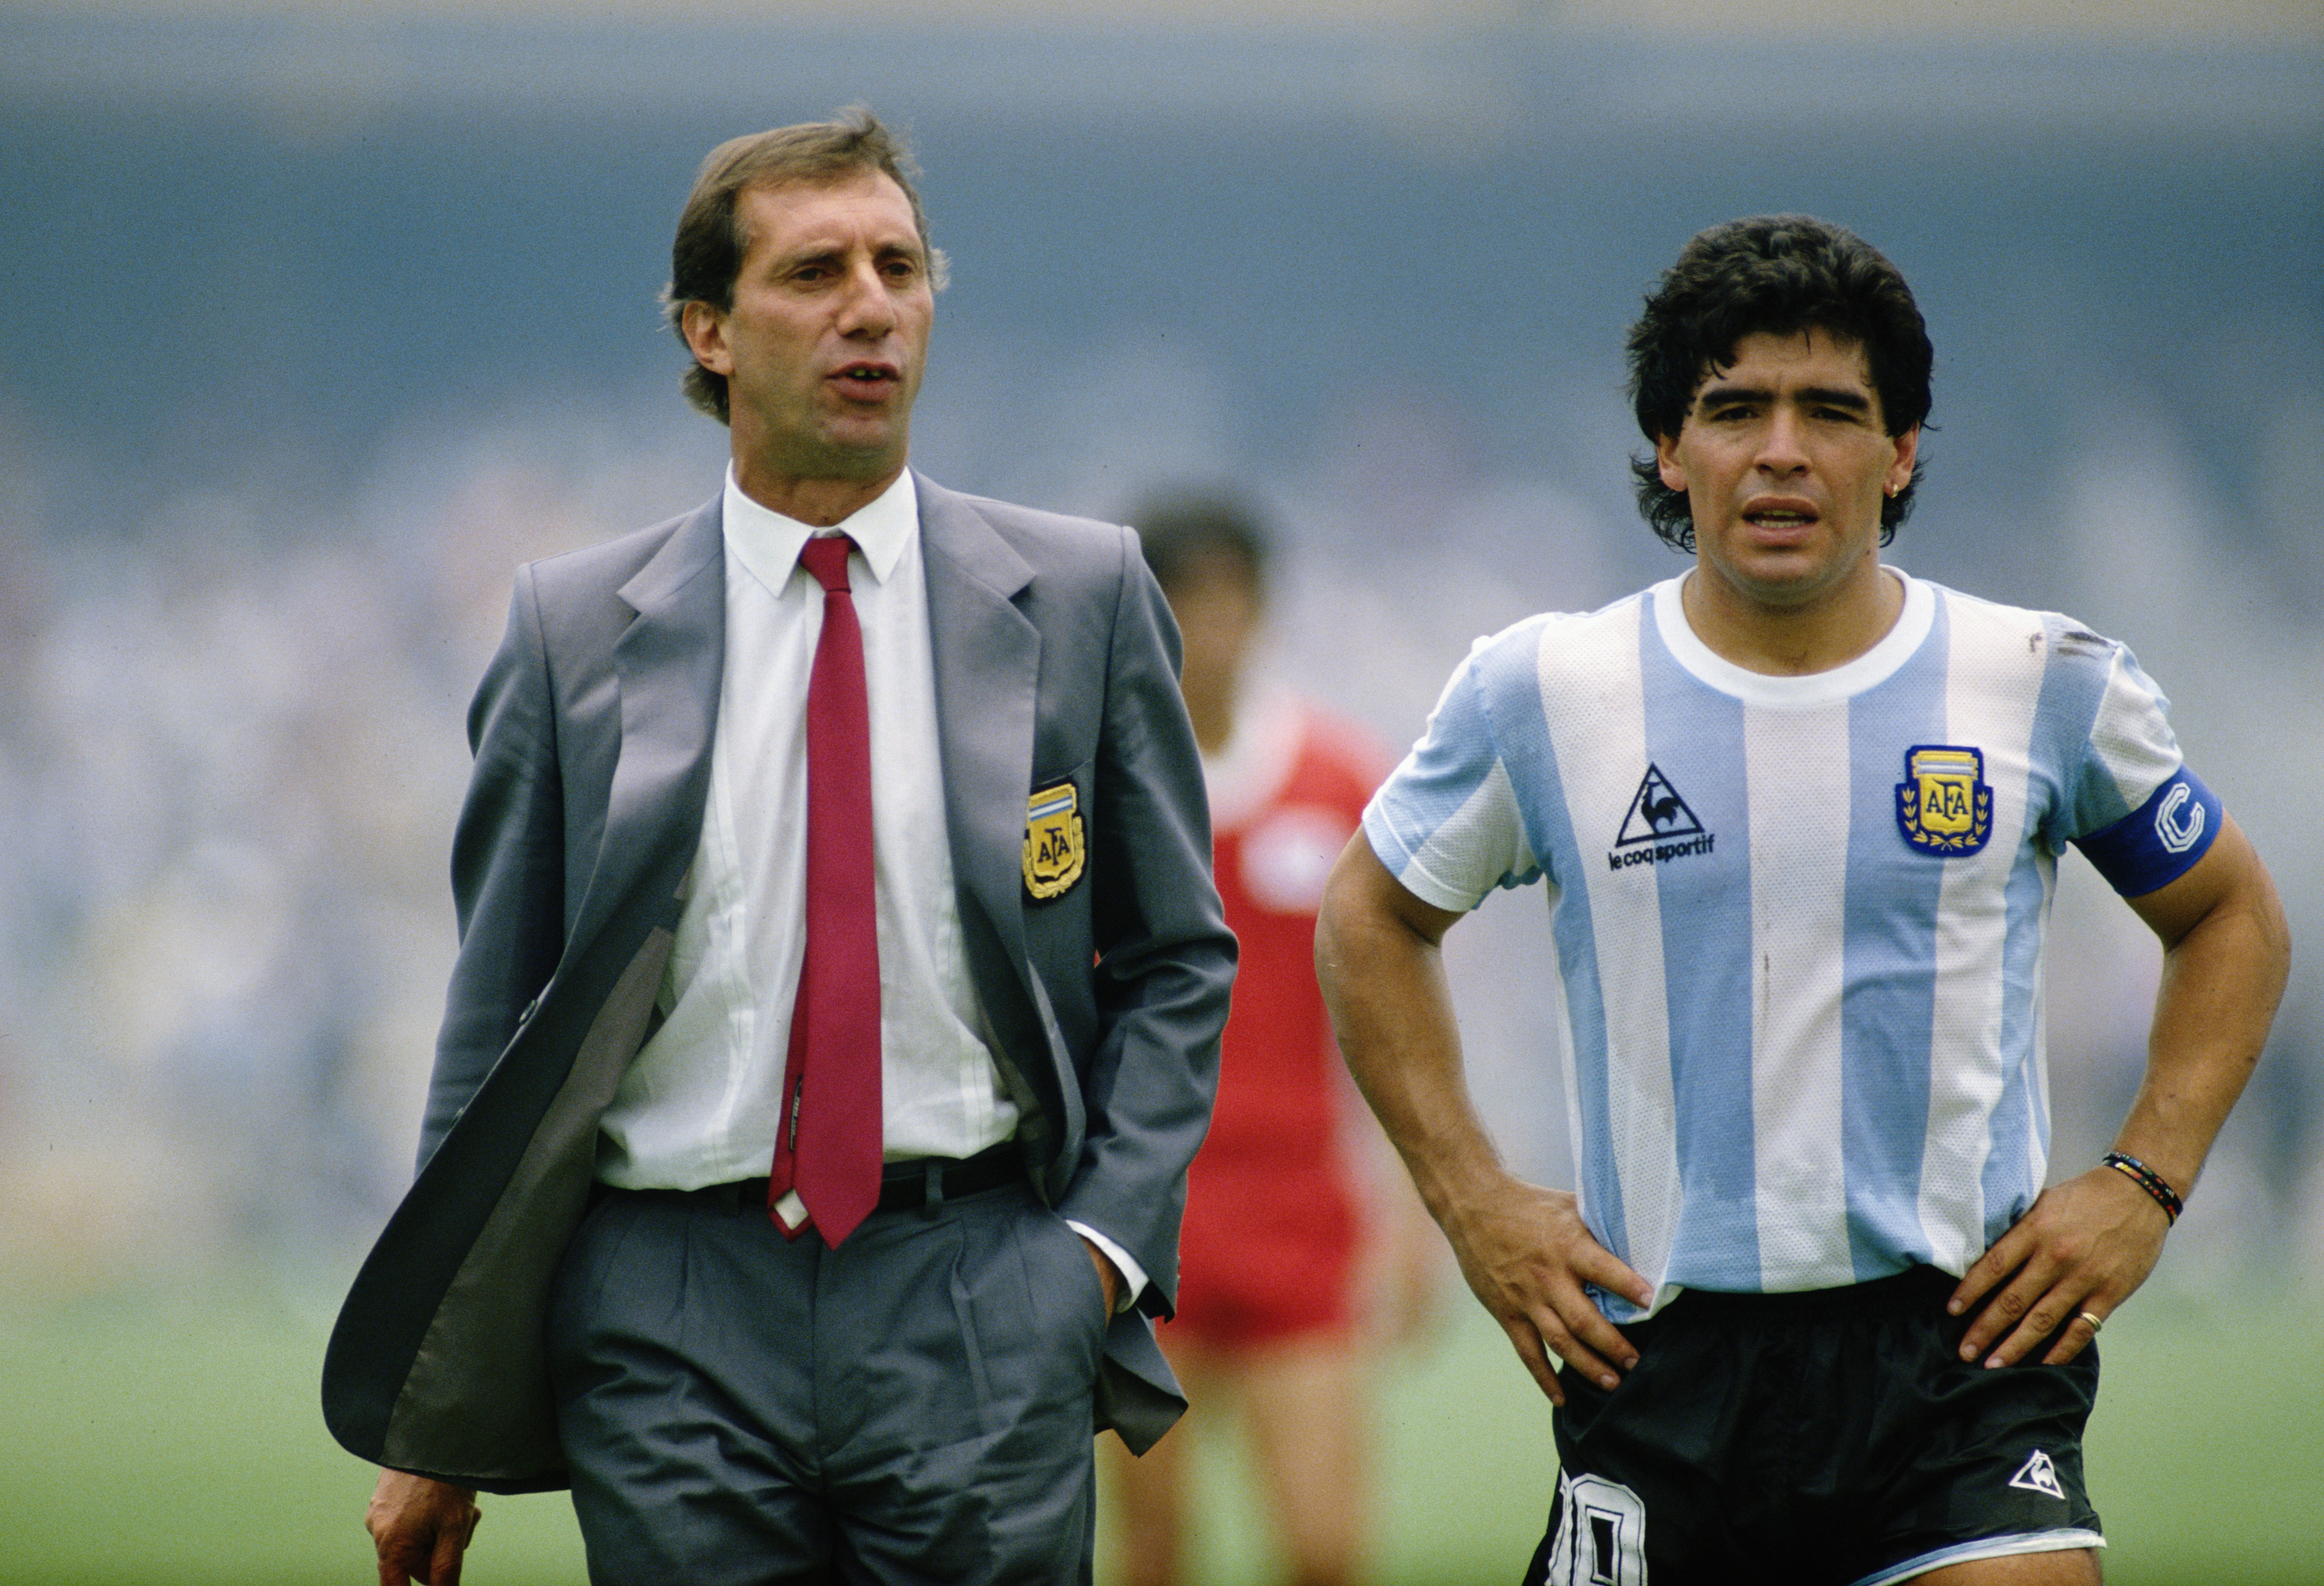 Carlos Bilardo et Diego Maradona lors de la Coupe du monde 1986